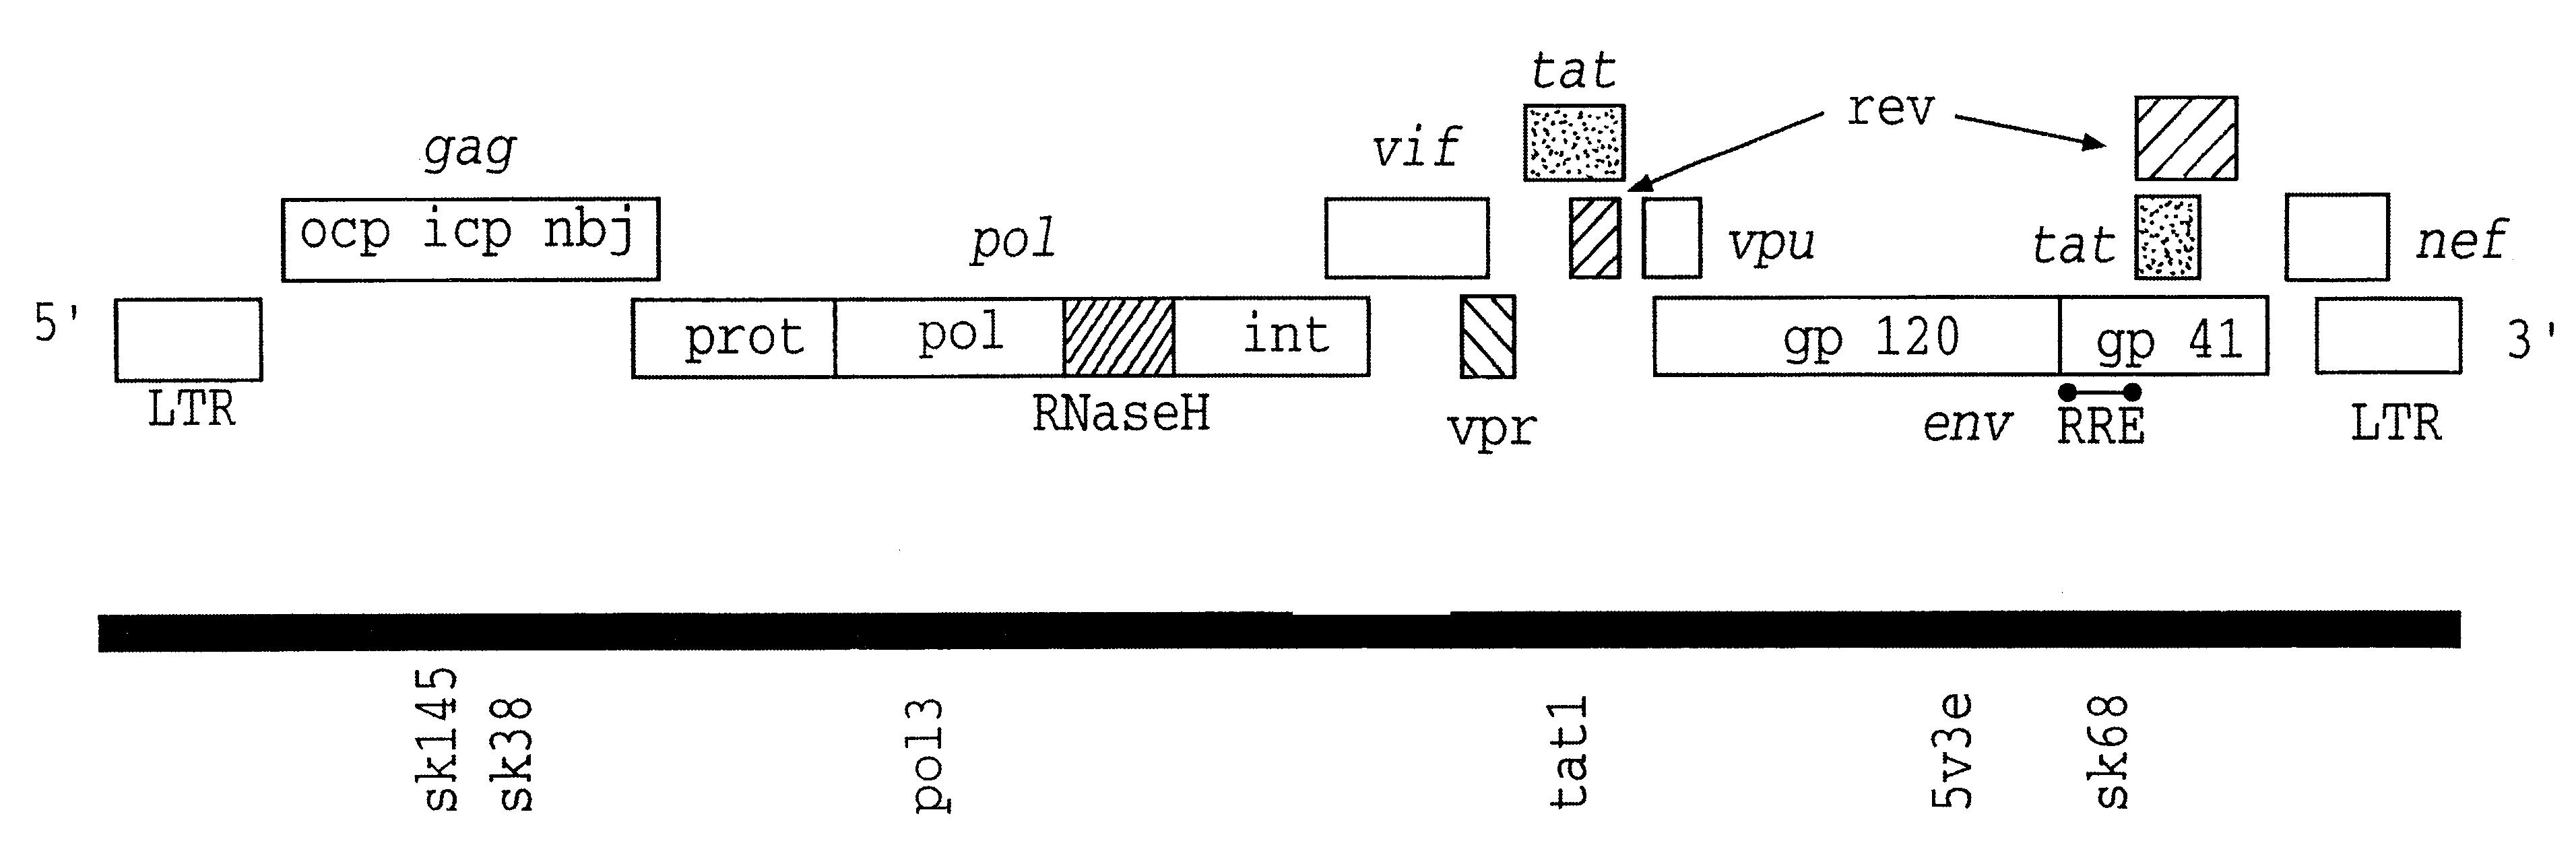 3824 lm358充电器电路图